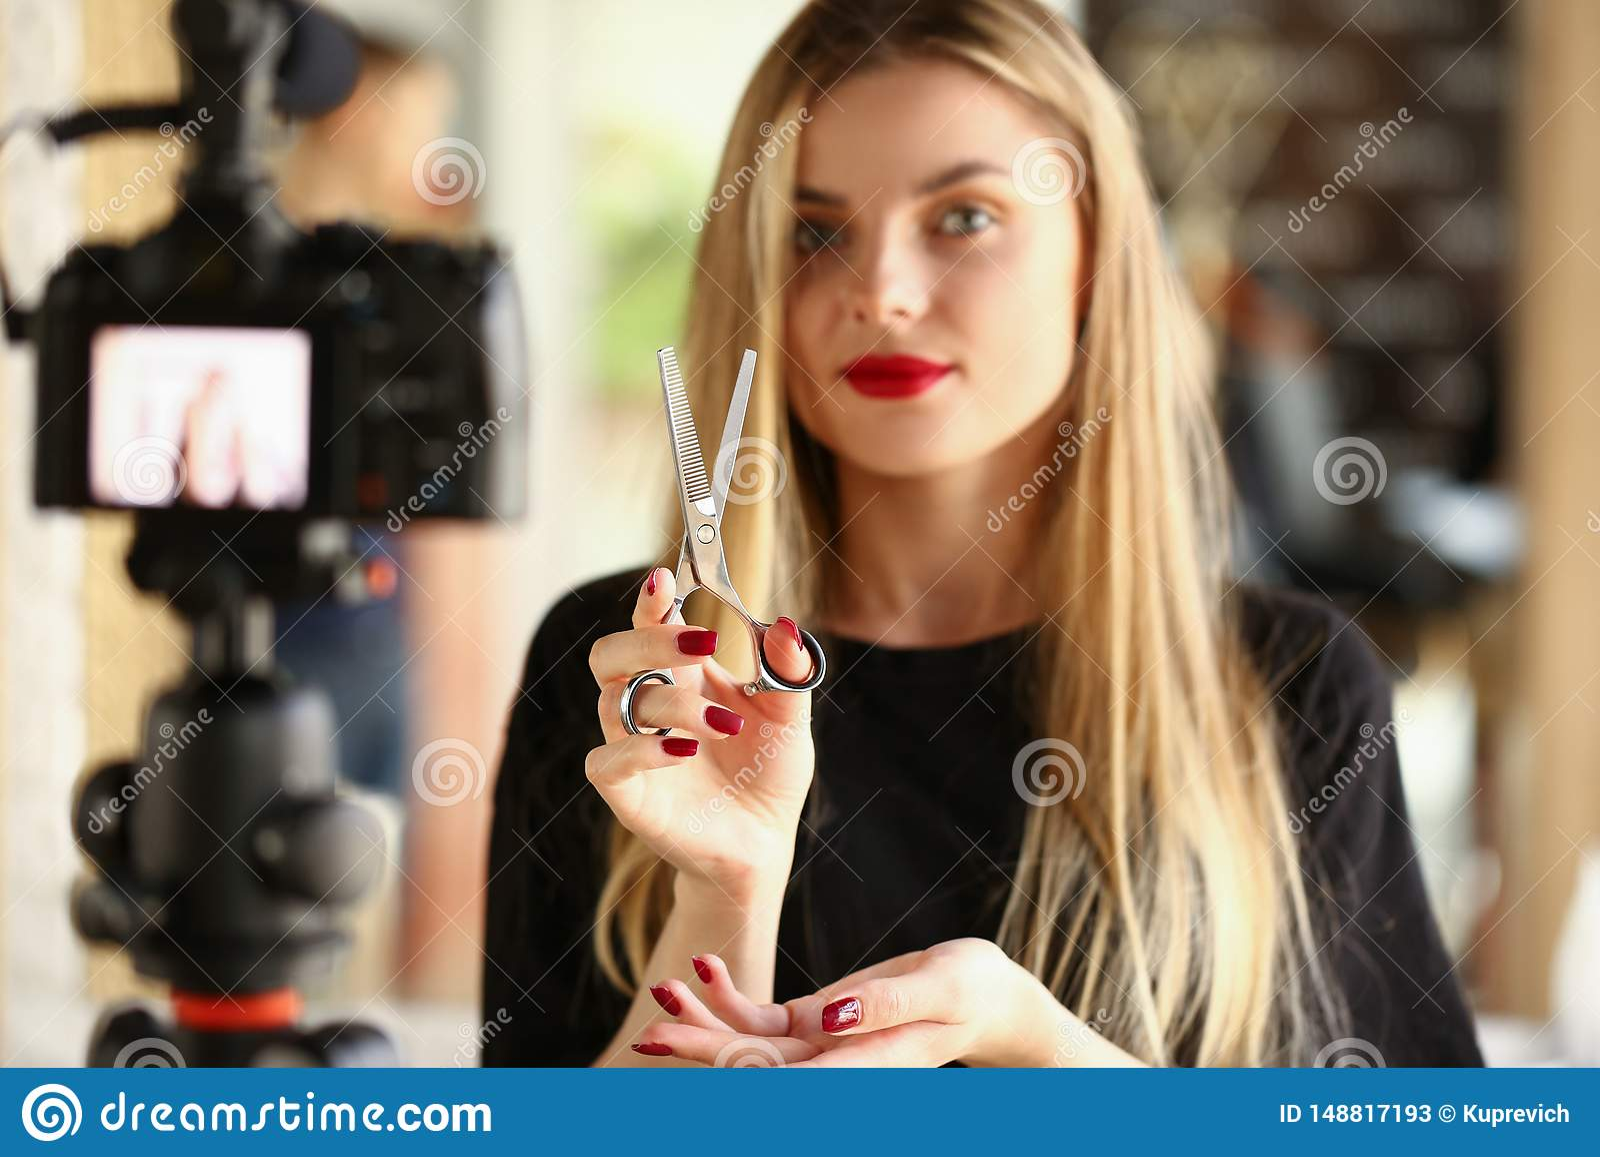 Blonde Woman Blogger Holding Metallic Scissors